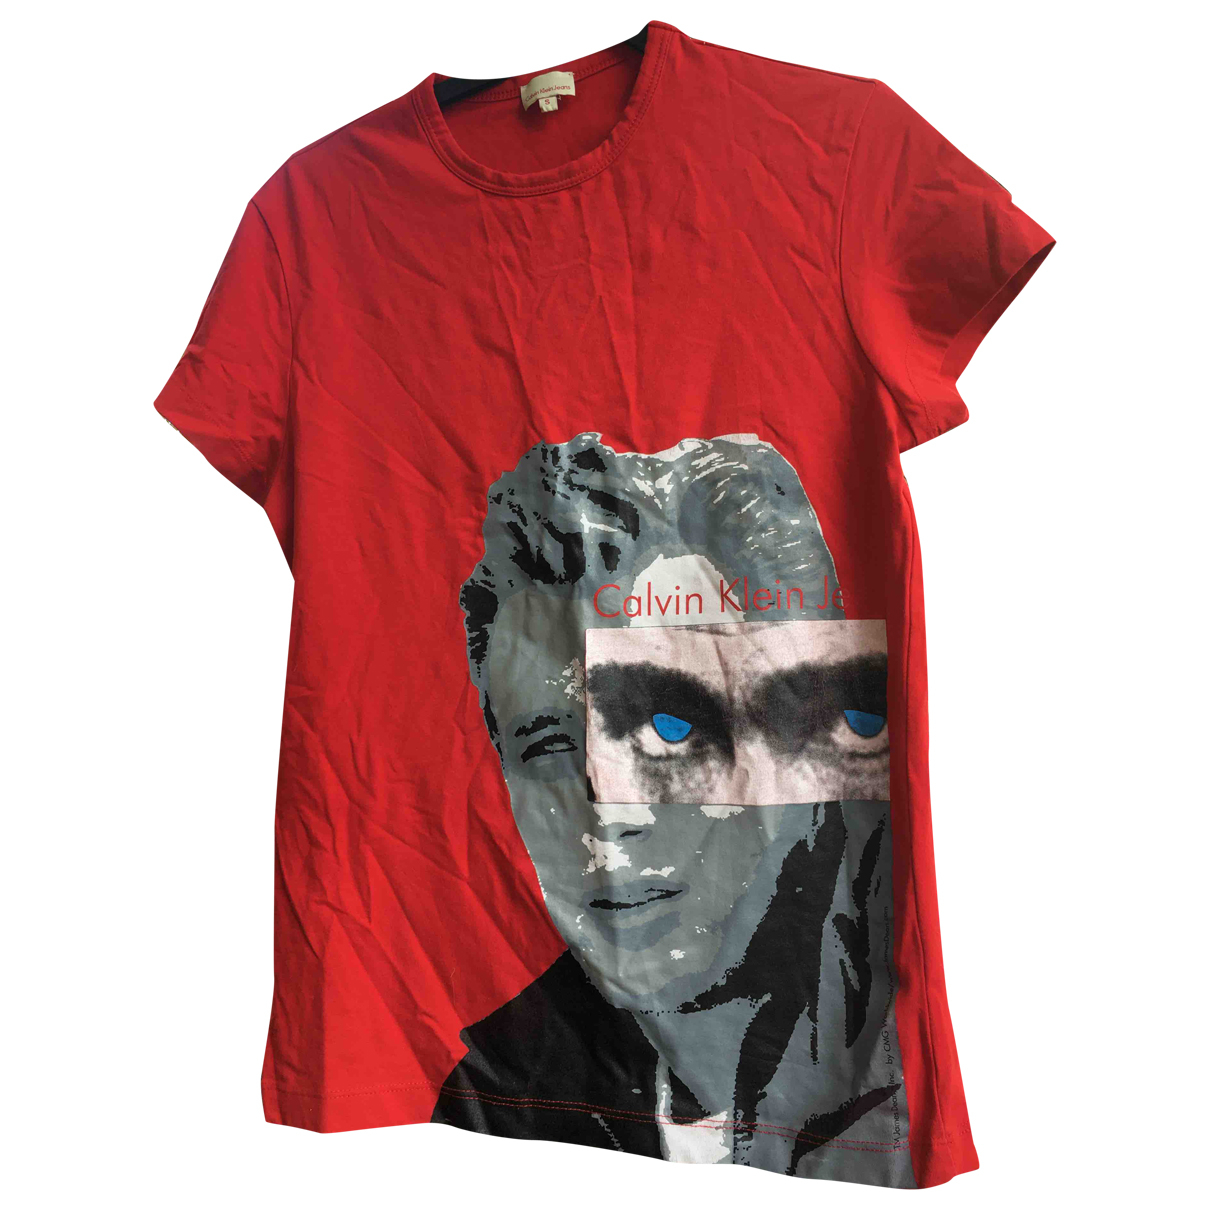 Calvin Klein - Tee shirts   pour homme en coton - rouge